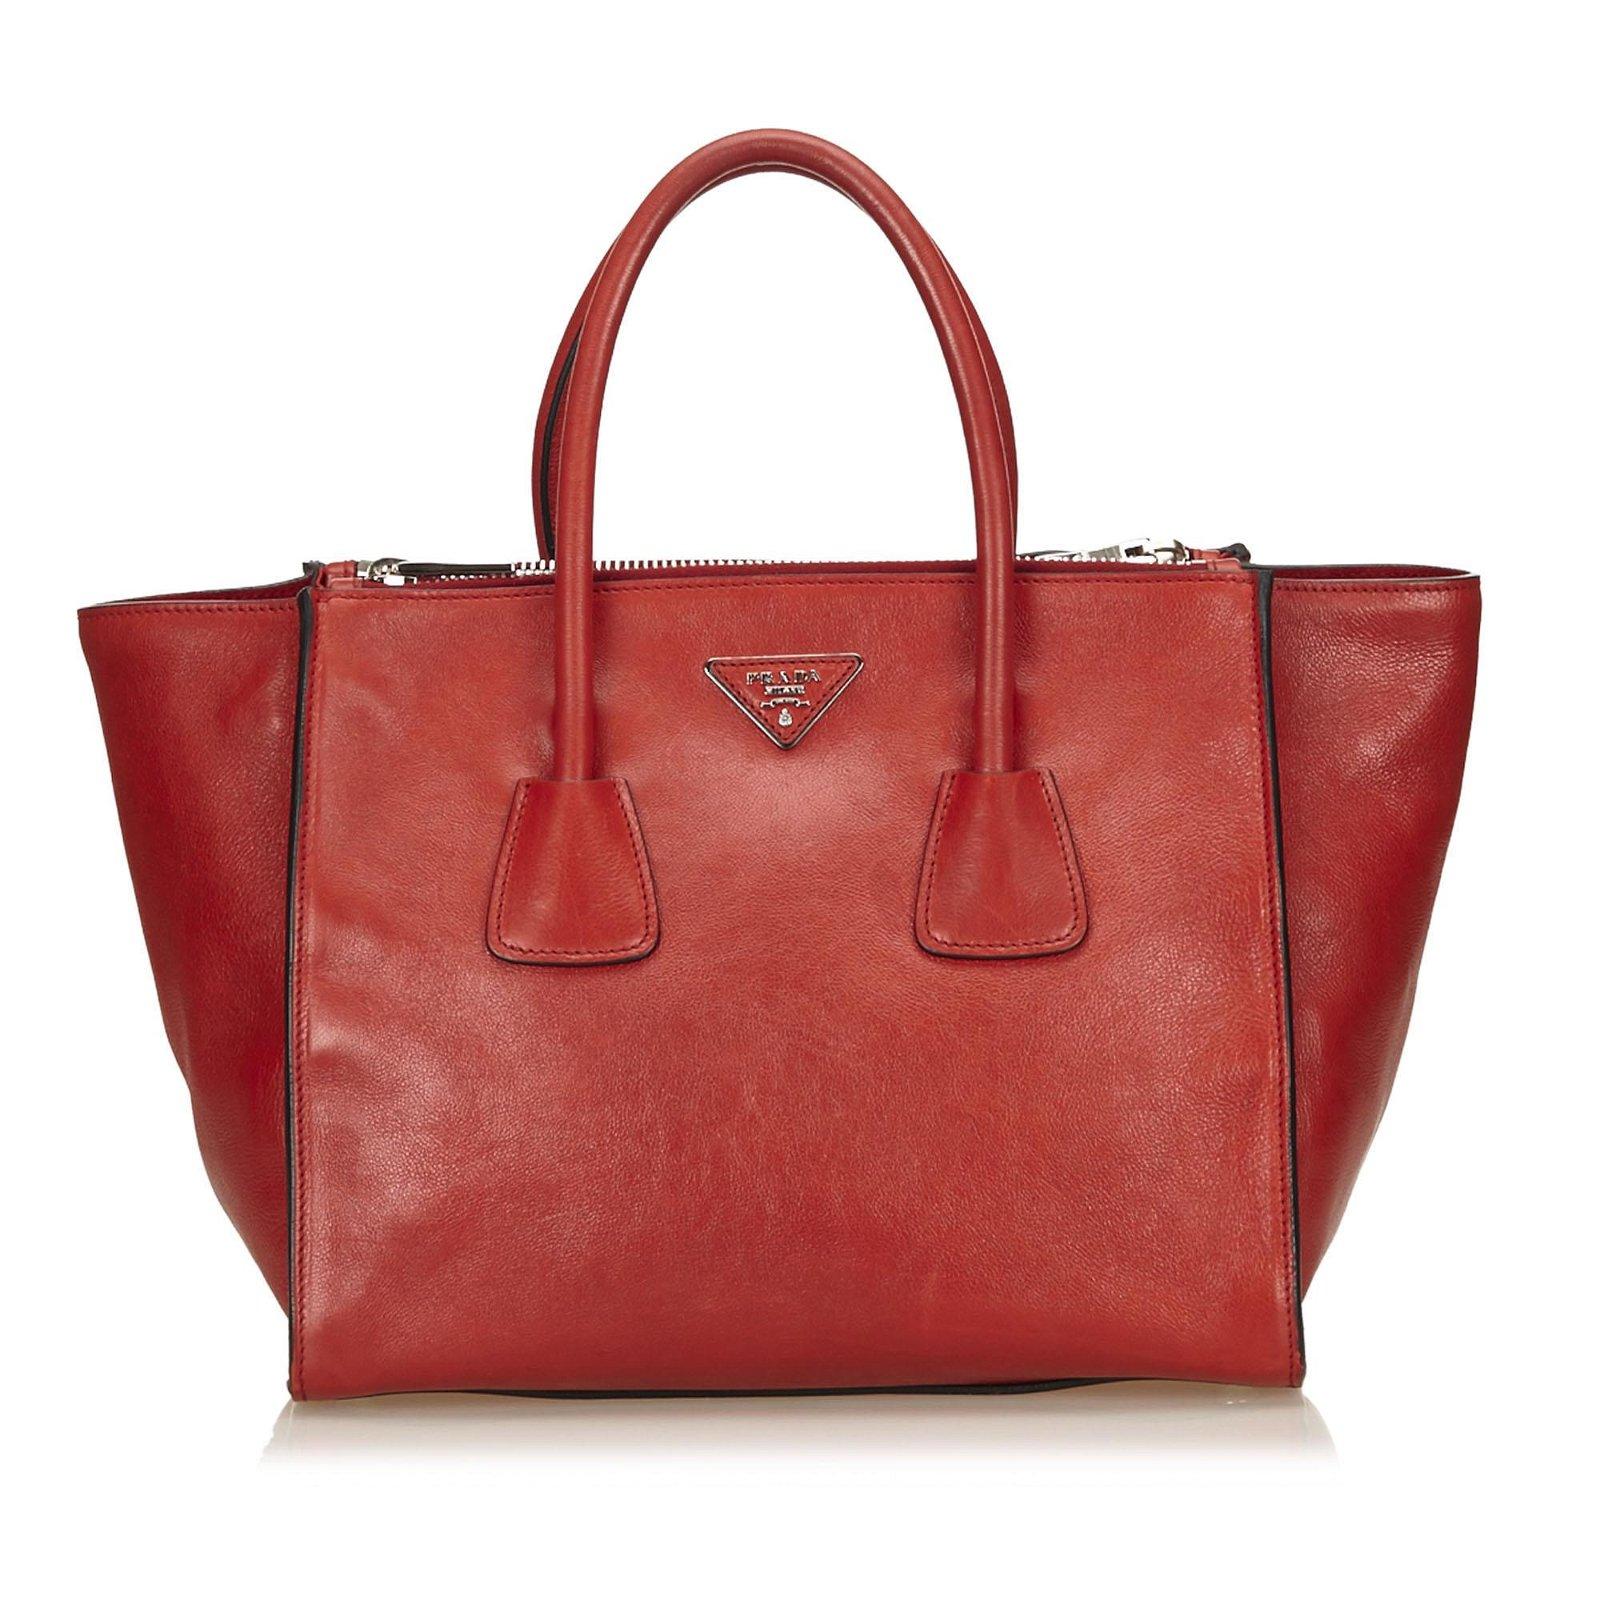 Authentic Prada Leather Saffiano Tote